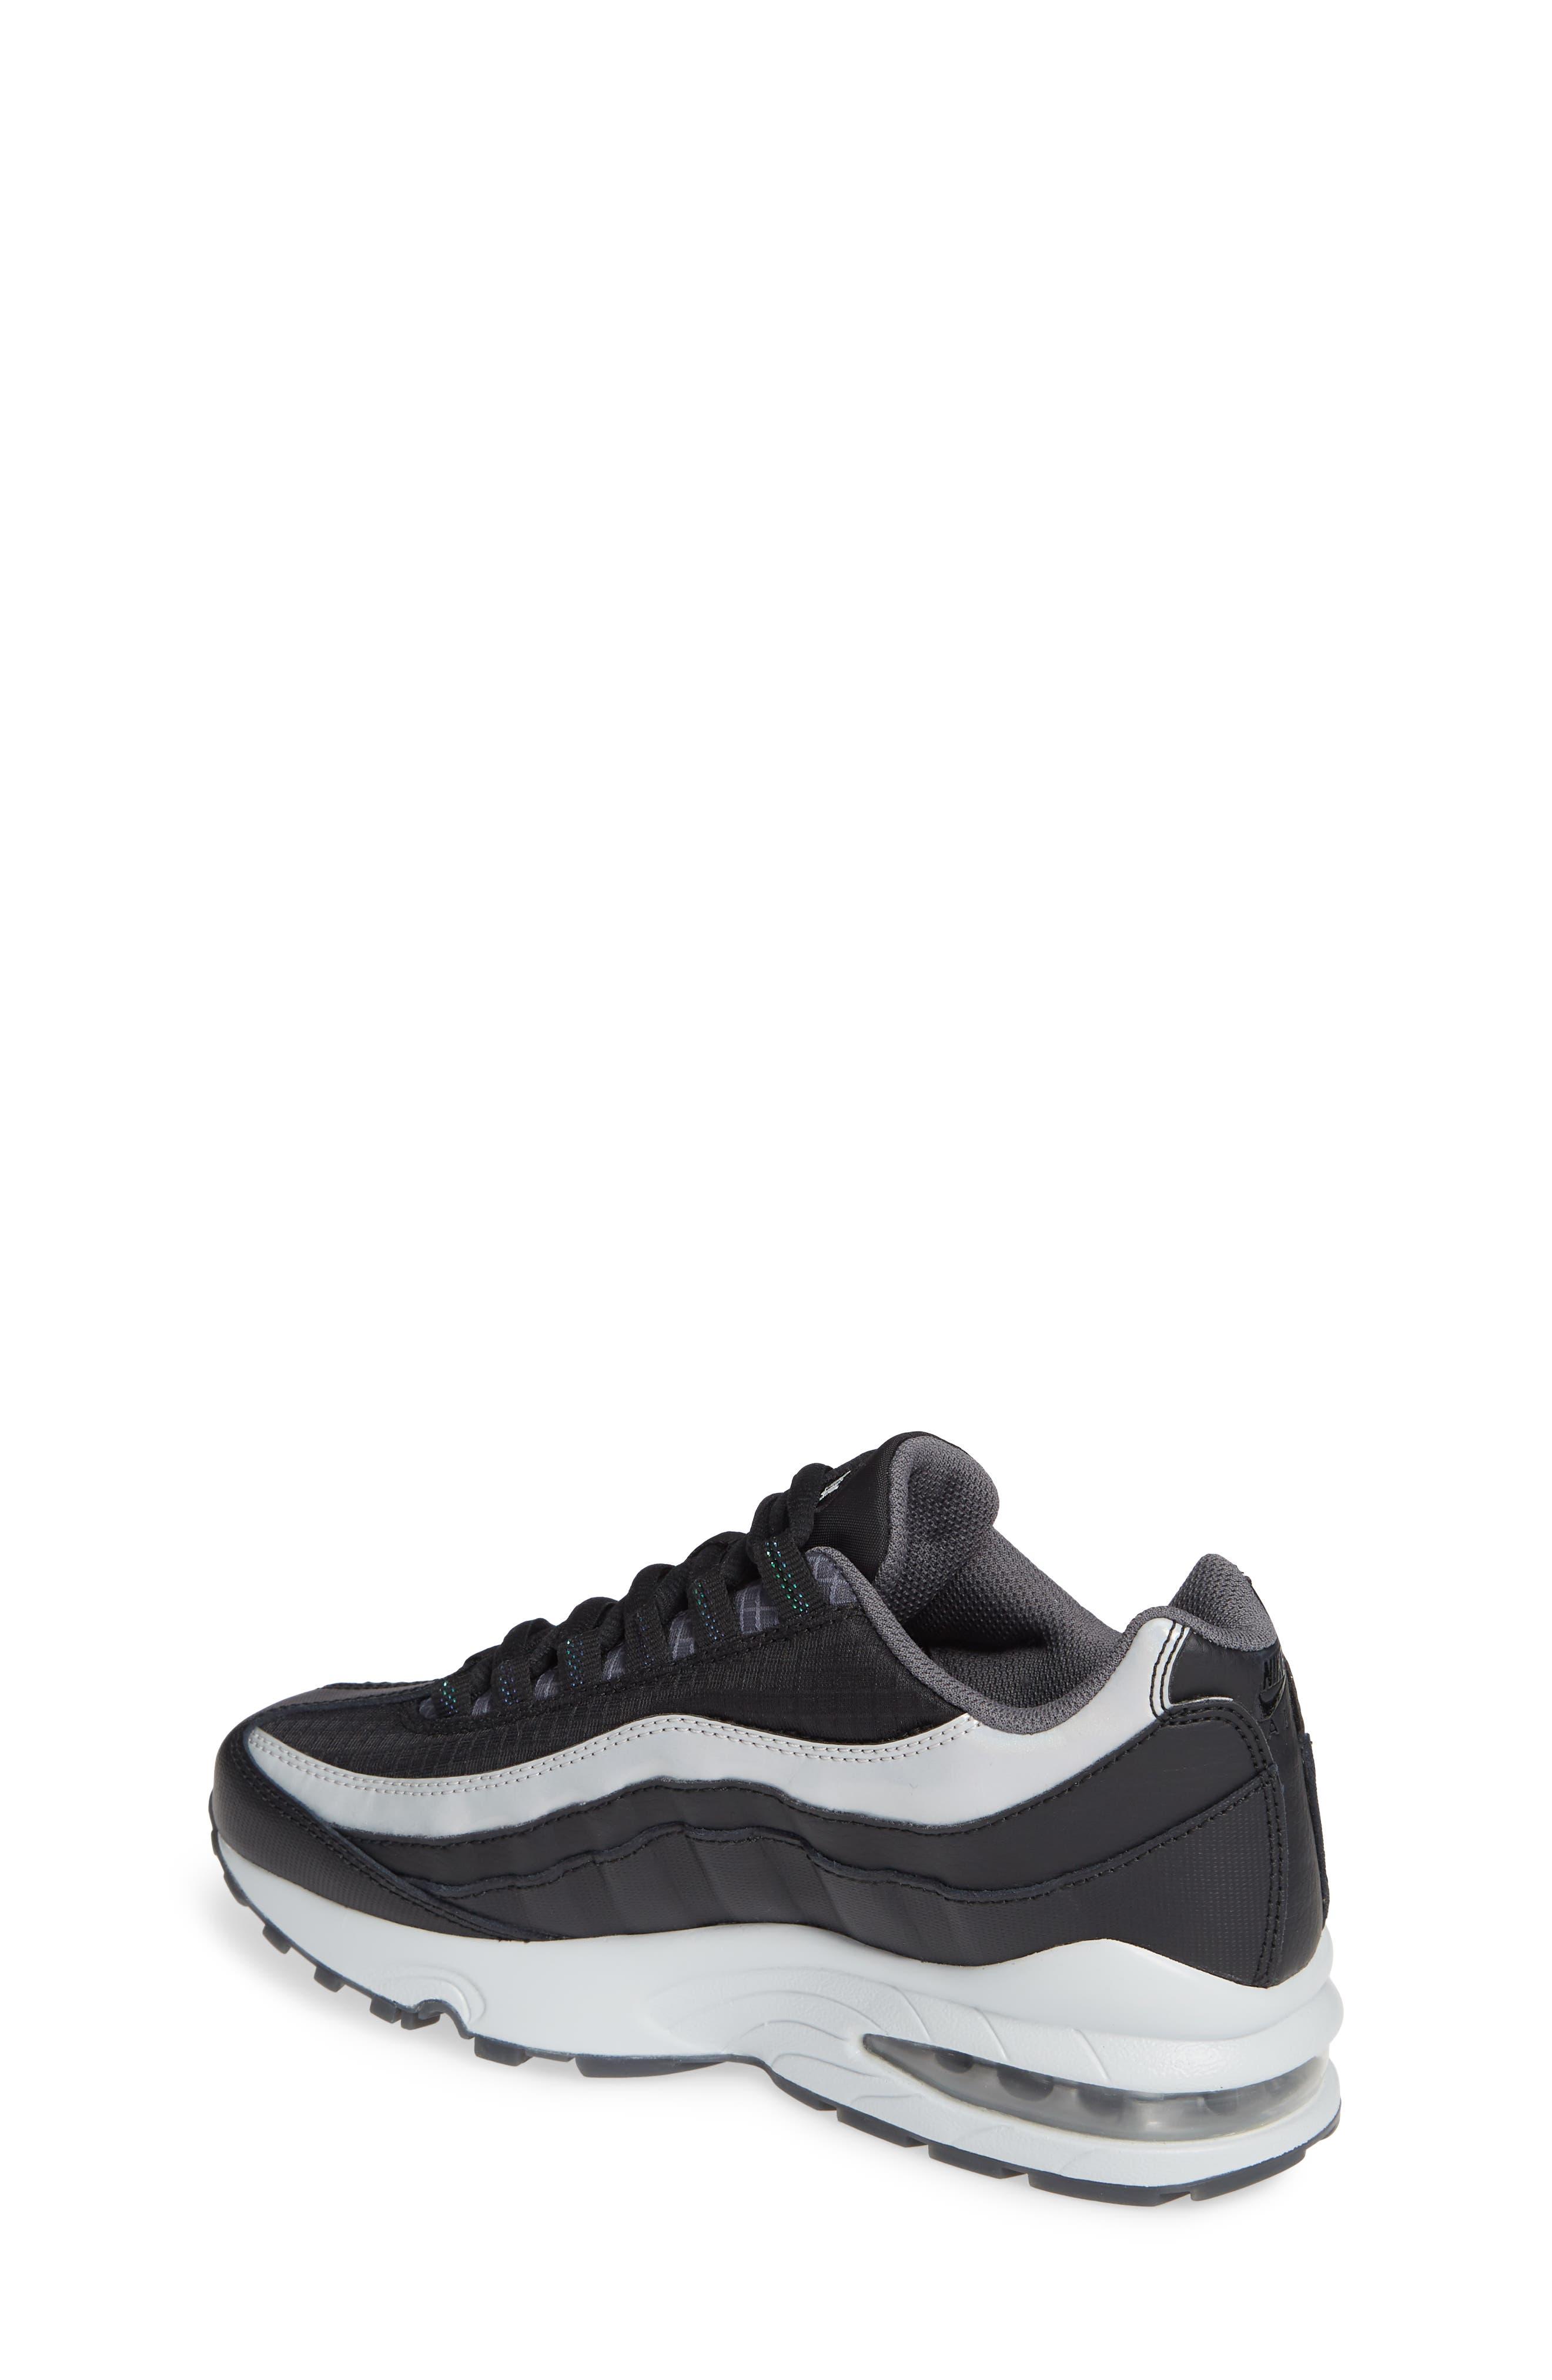 Air Max 95 Y2K Sneaker,                             Alternate thumbnail 2, color,                             BLACK METALLIC SILVER